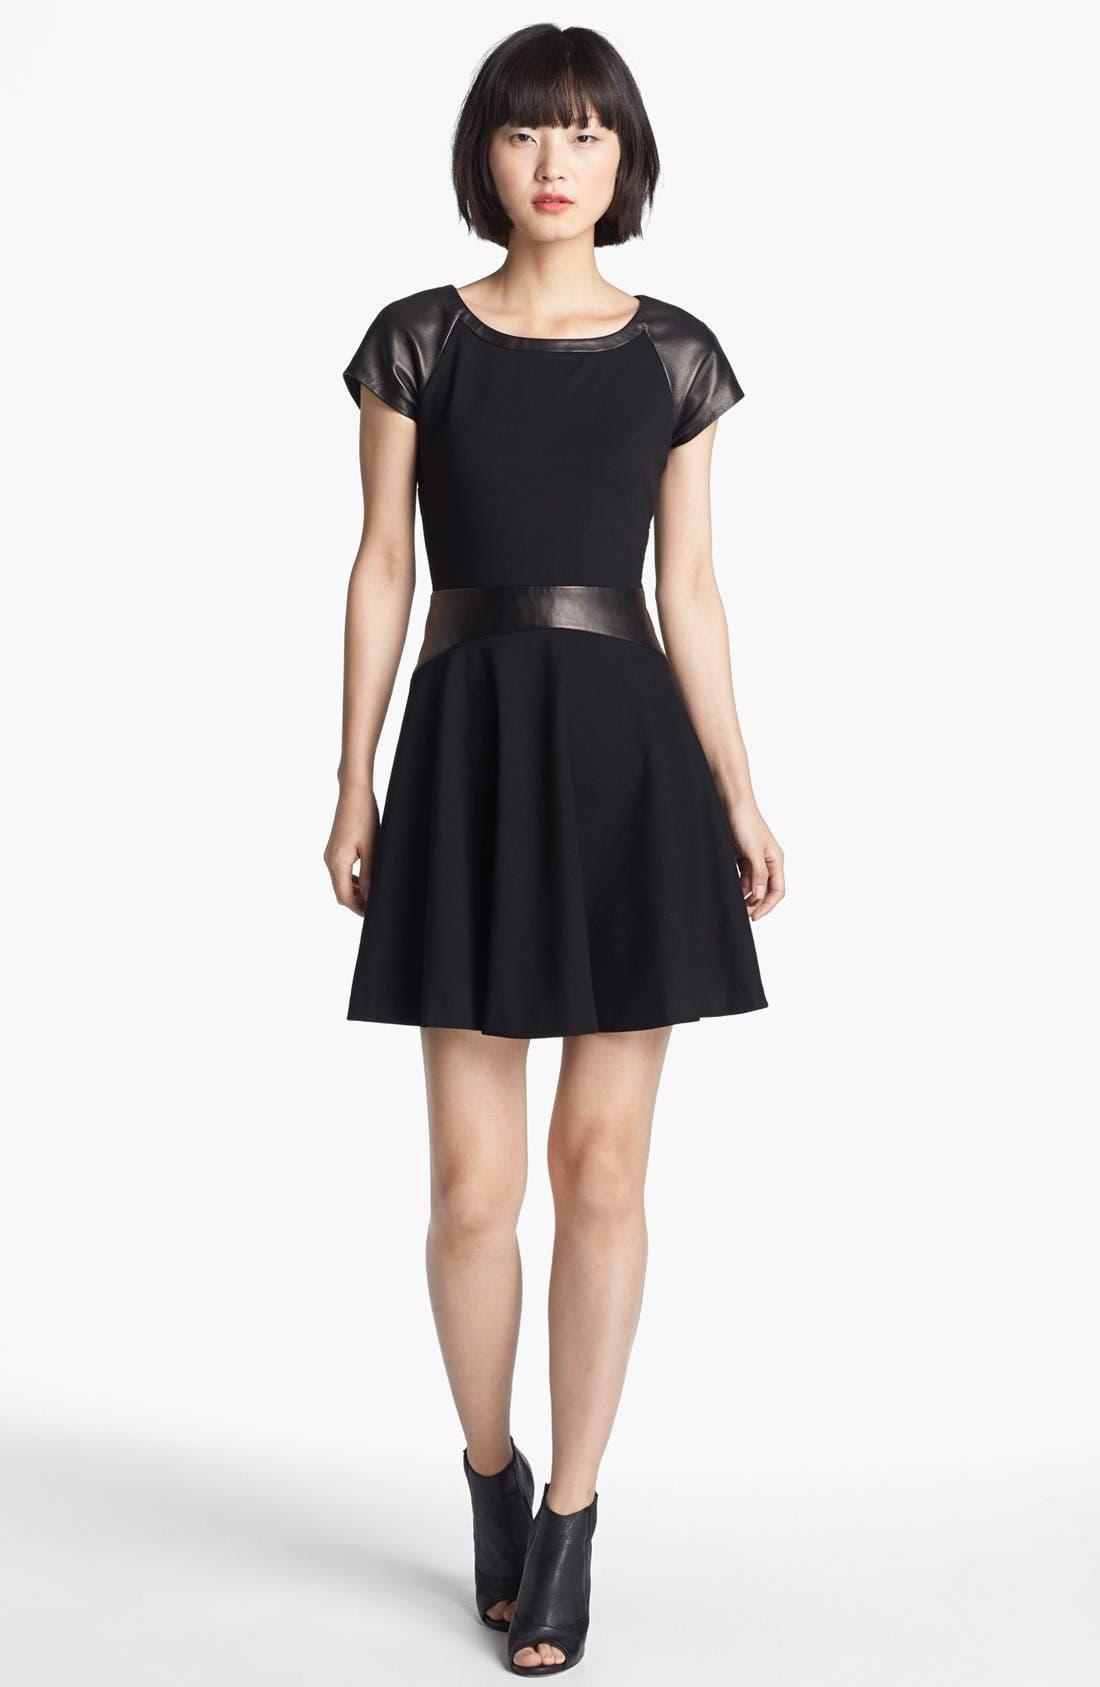 Main Image - Diane von Furstenberg 'Delyse' Leather Trim Dress